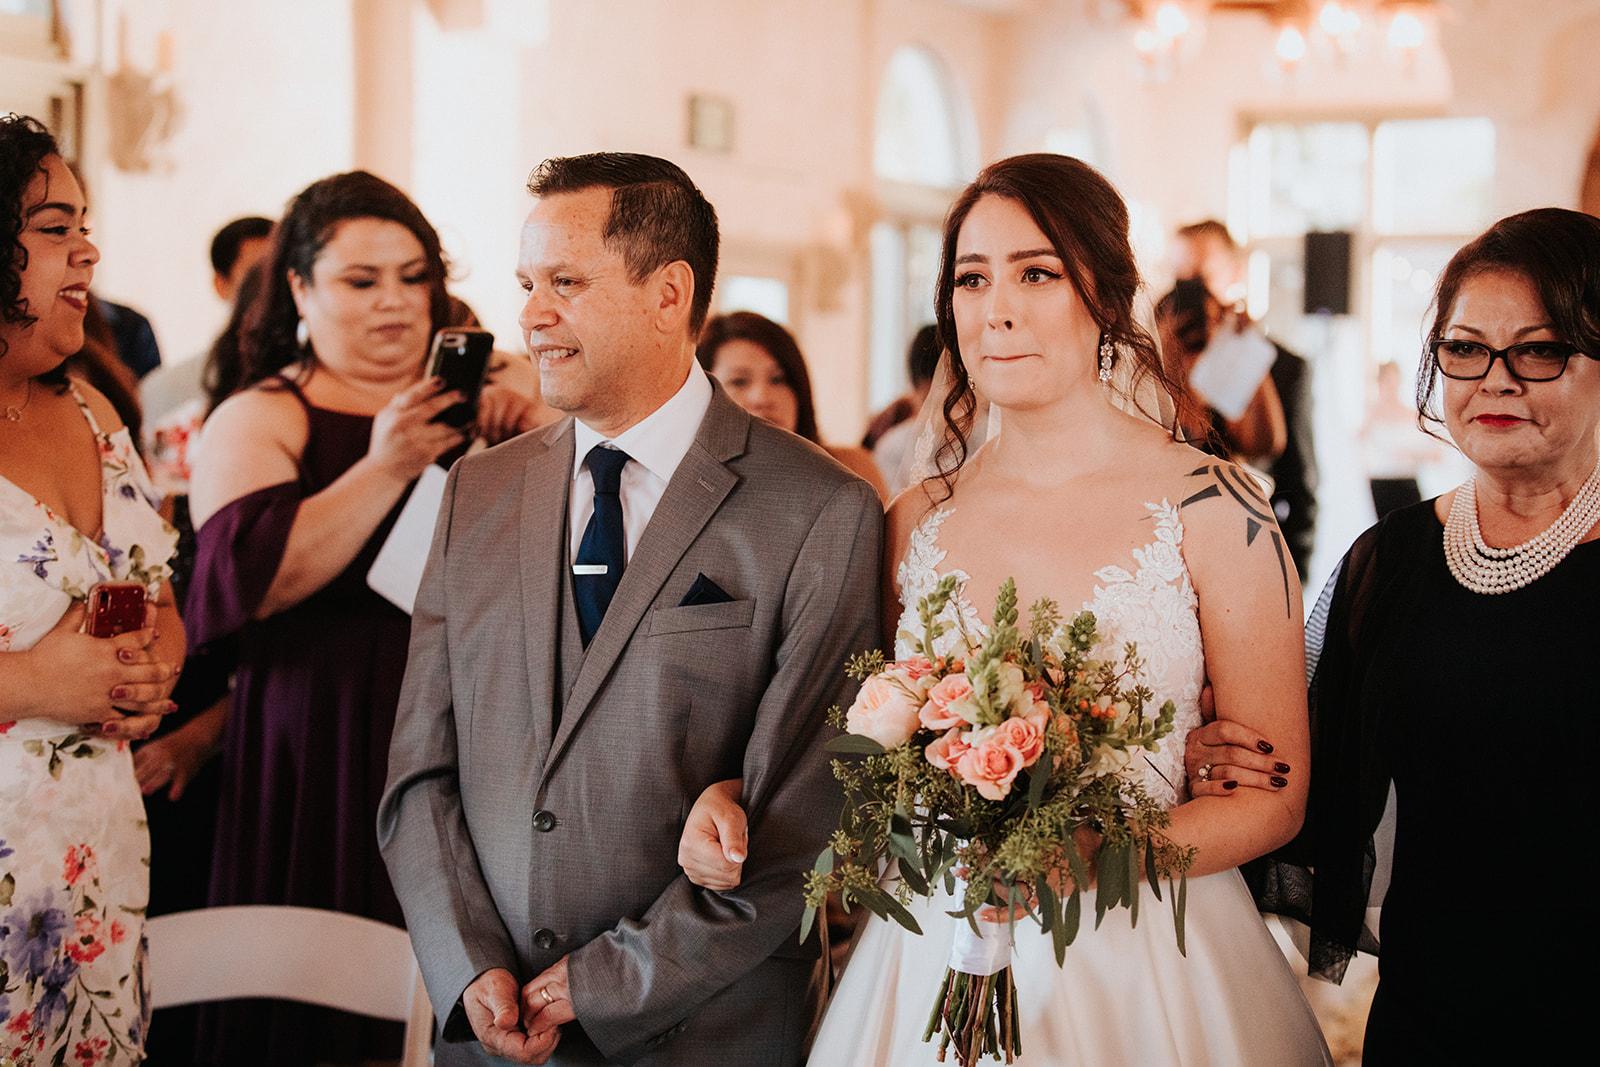 Jessica_+_JD_Wedding_-_Diana_Ascarrunz_Photography-395.jpg